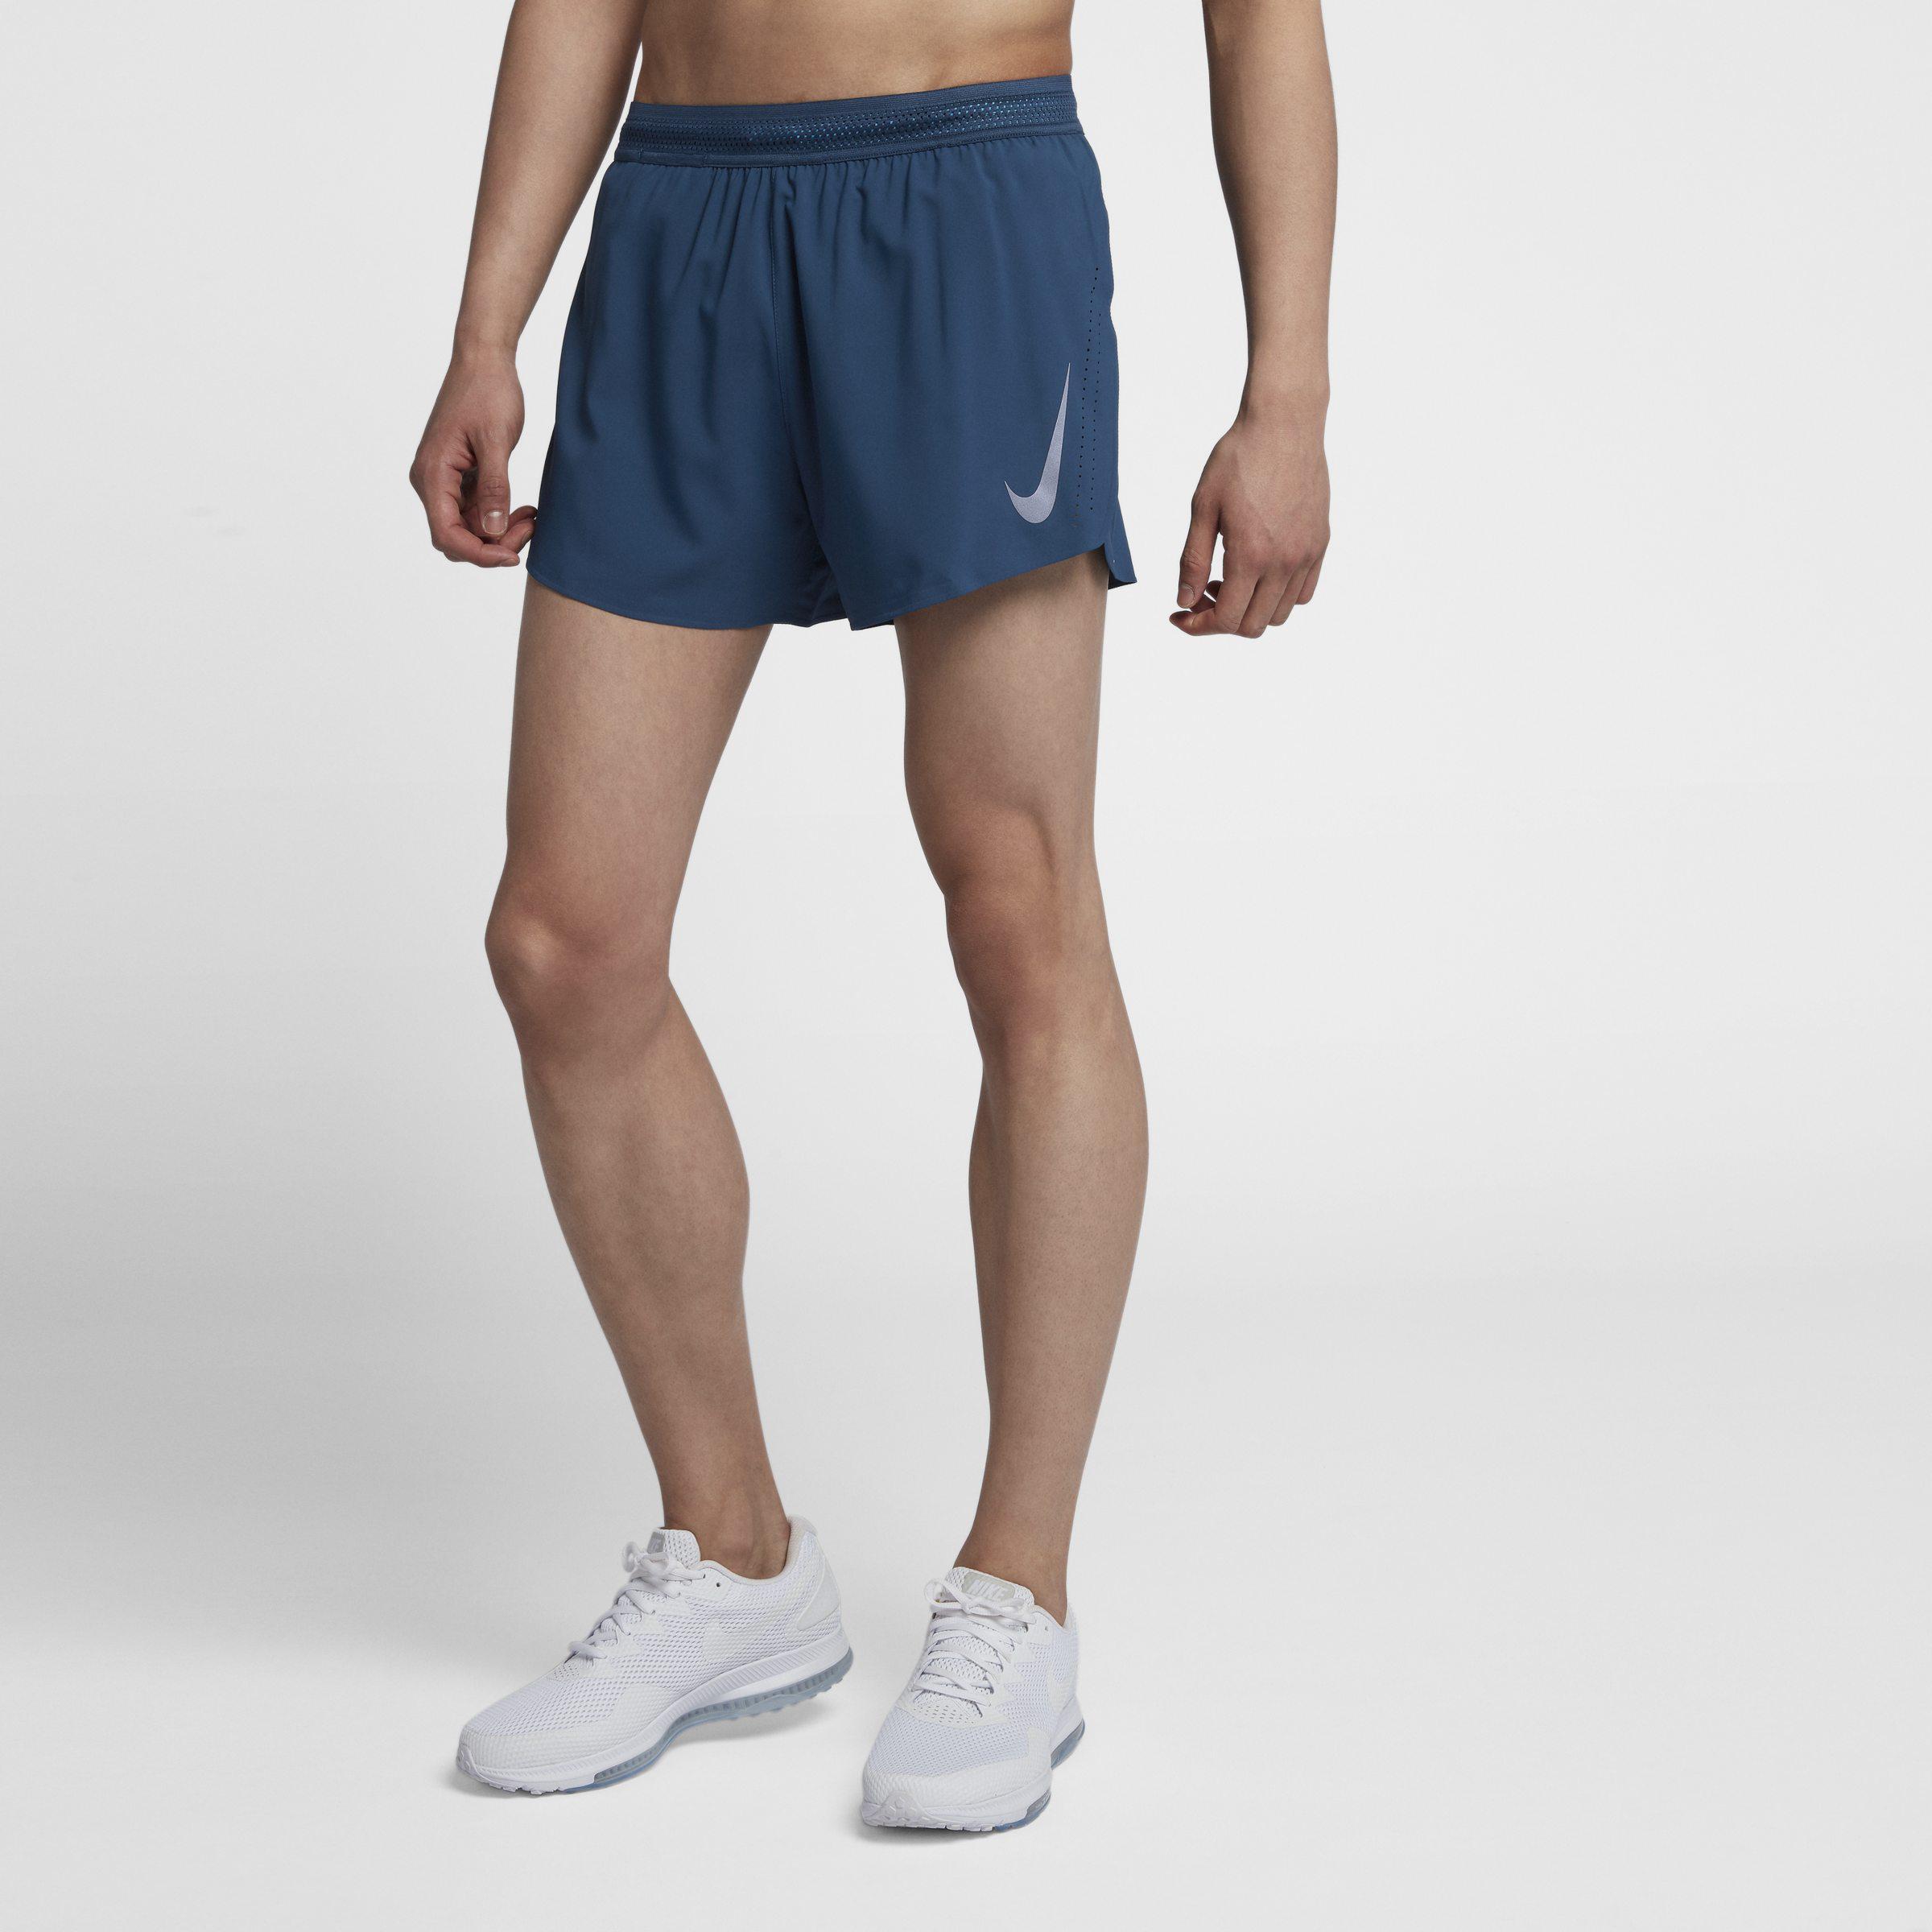 547e0090f5 Nike Blue Aeroswift 4